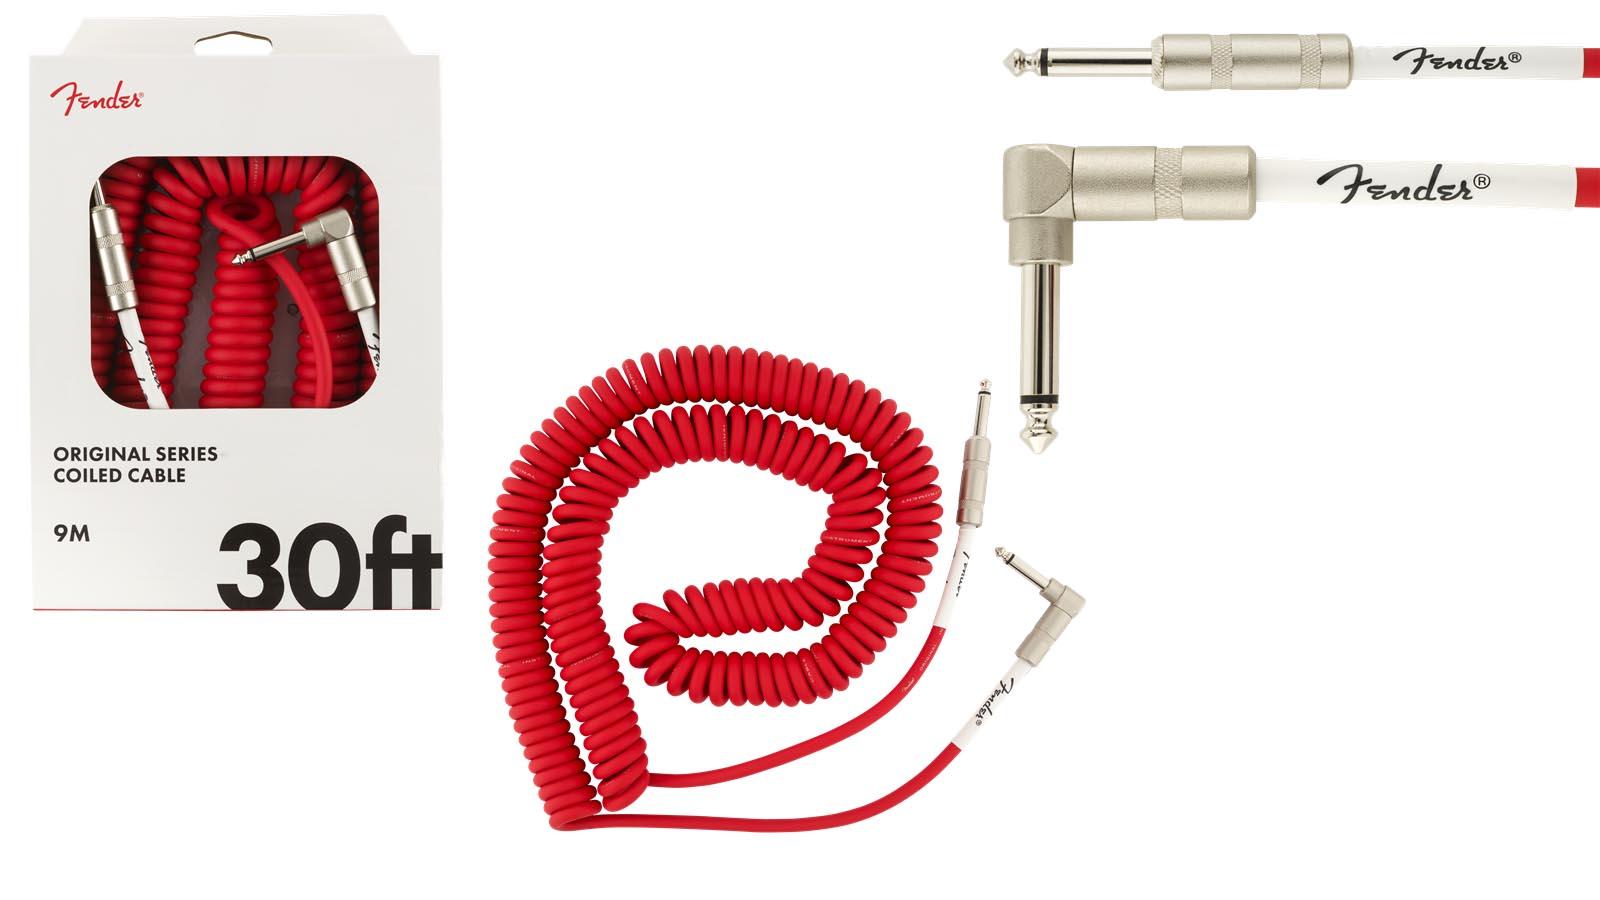 Fender Original Spiral Kabel 9m FR Fiesta Red